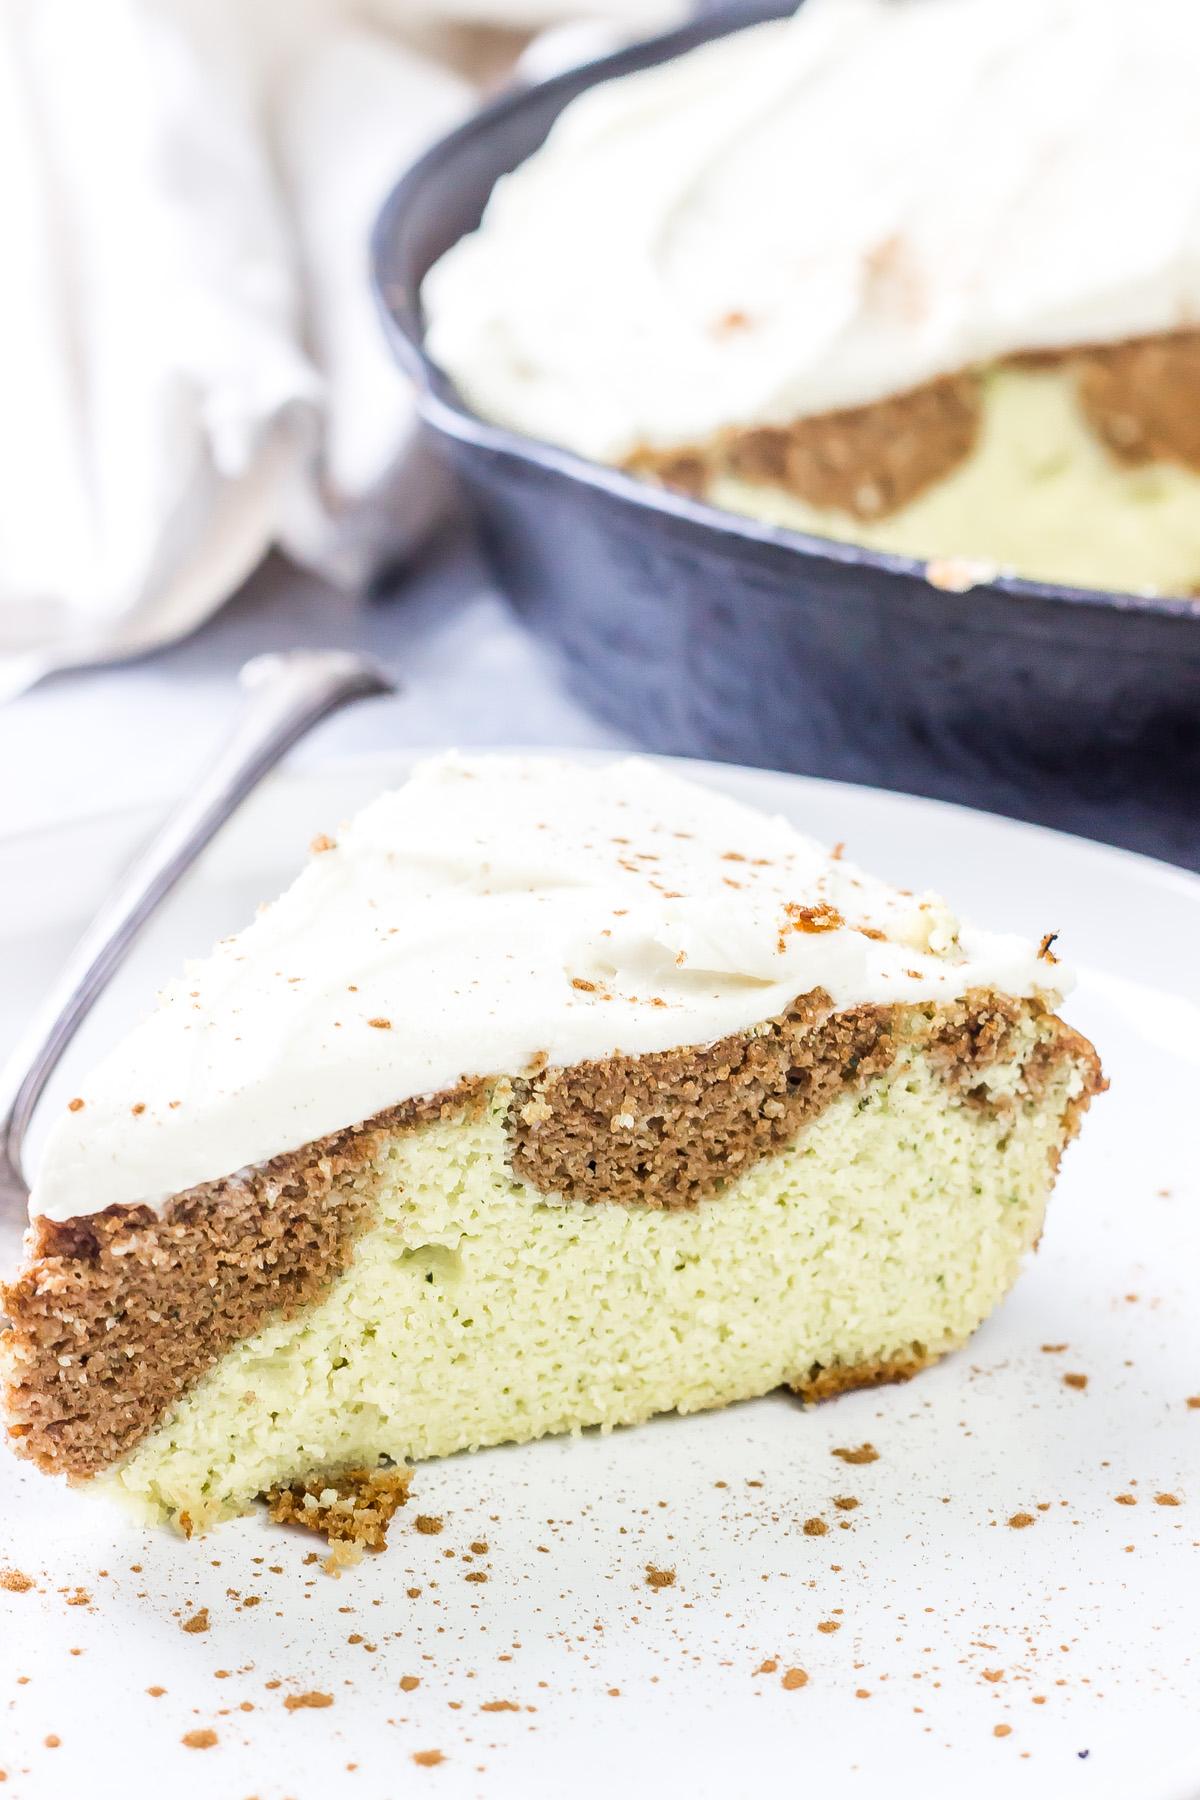 Keto Cinnamon Roll Cake